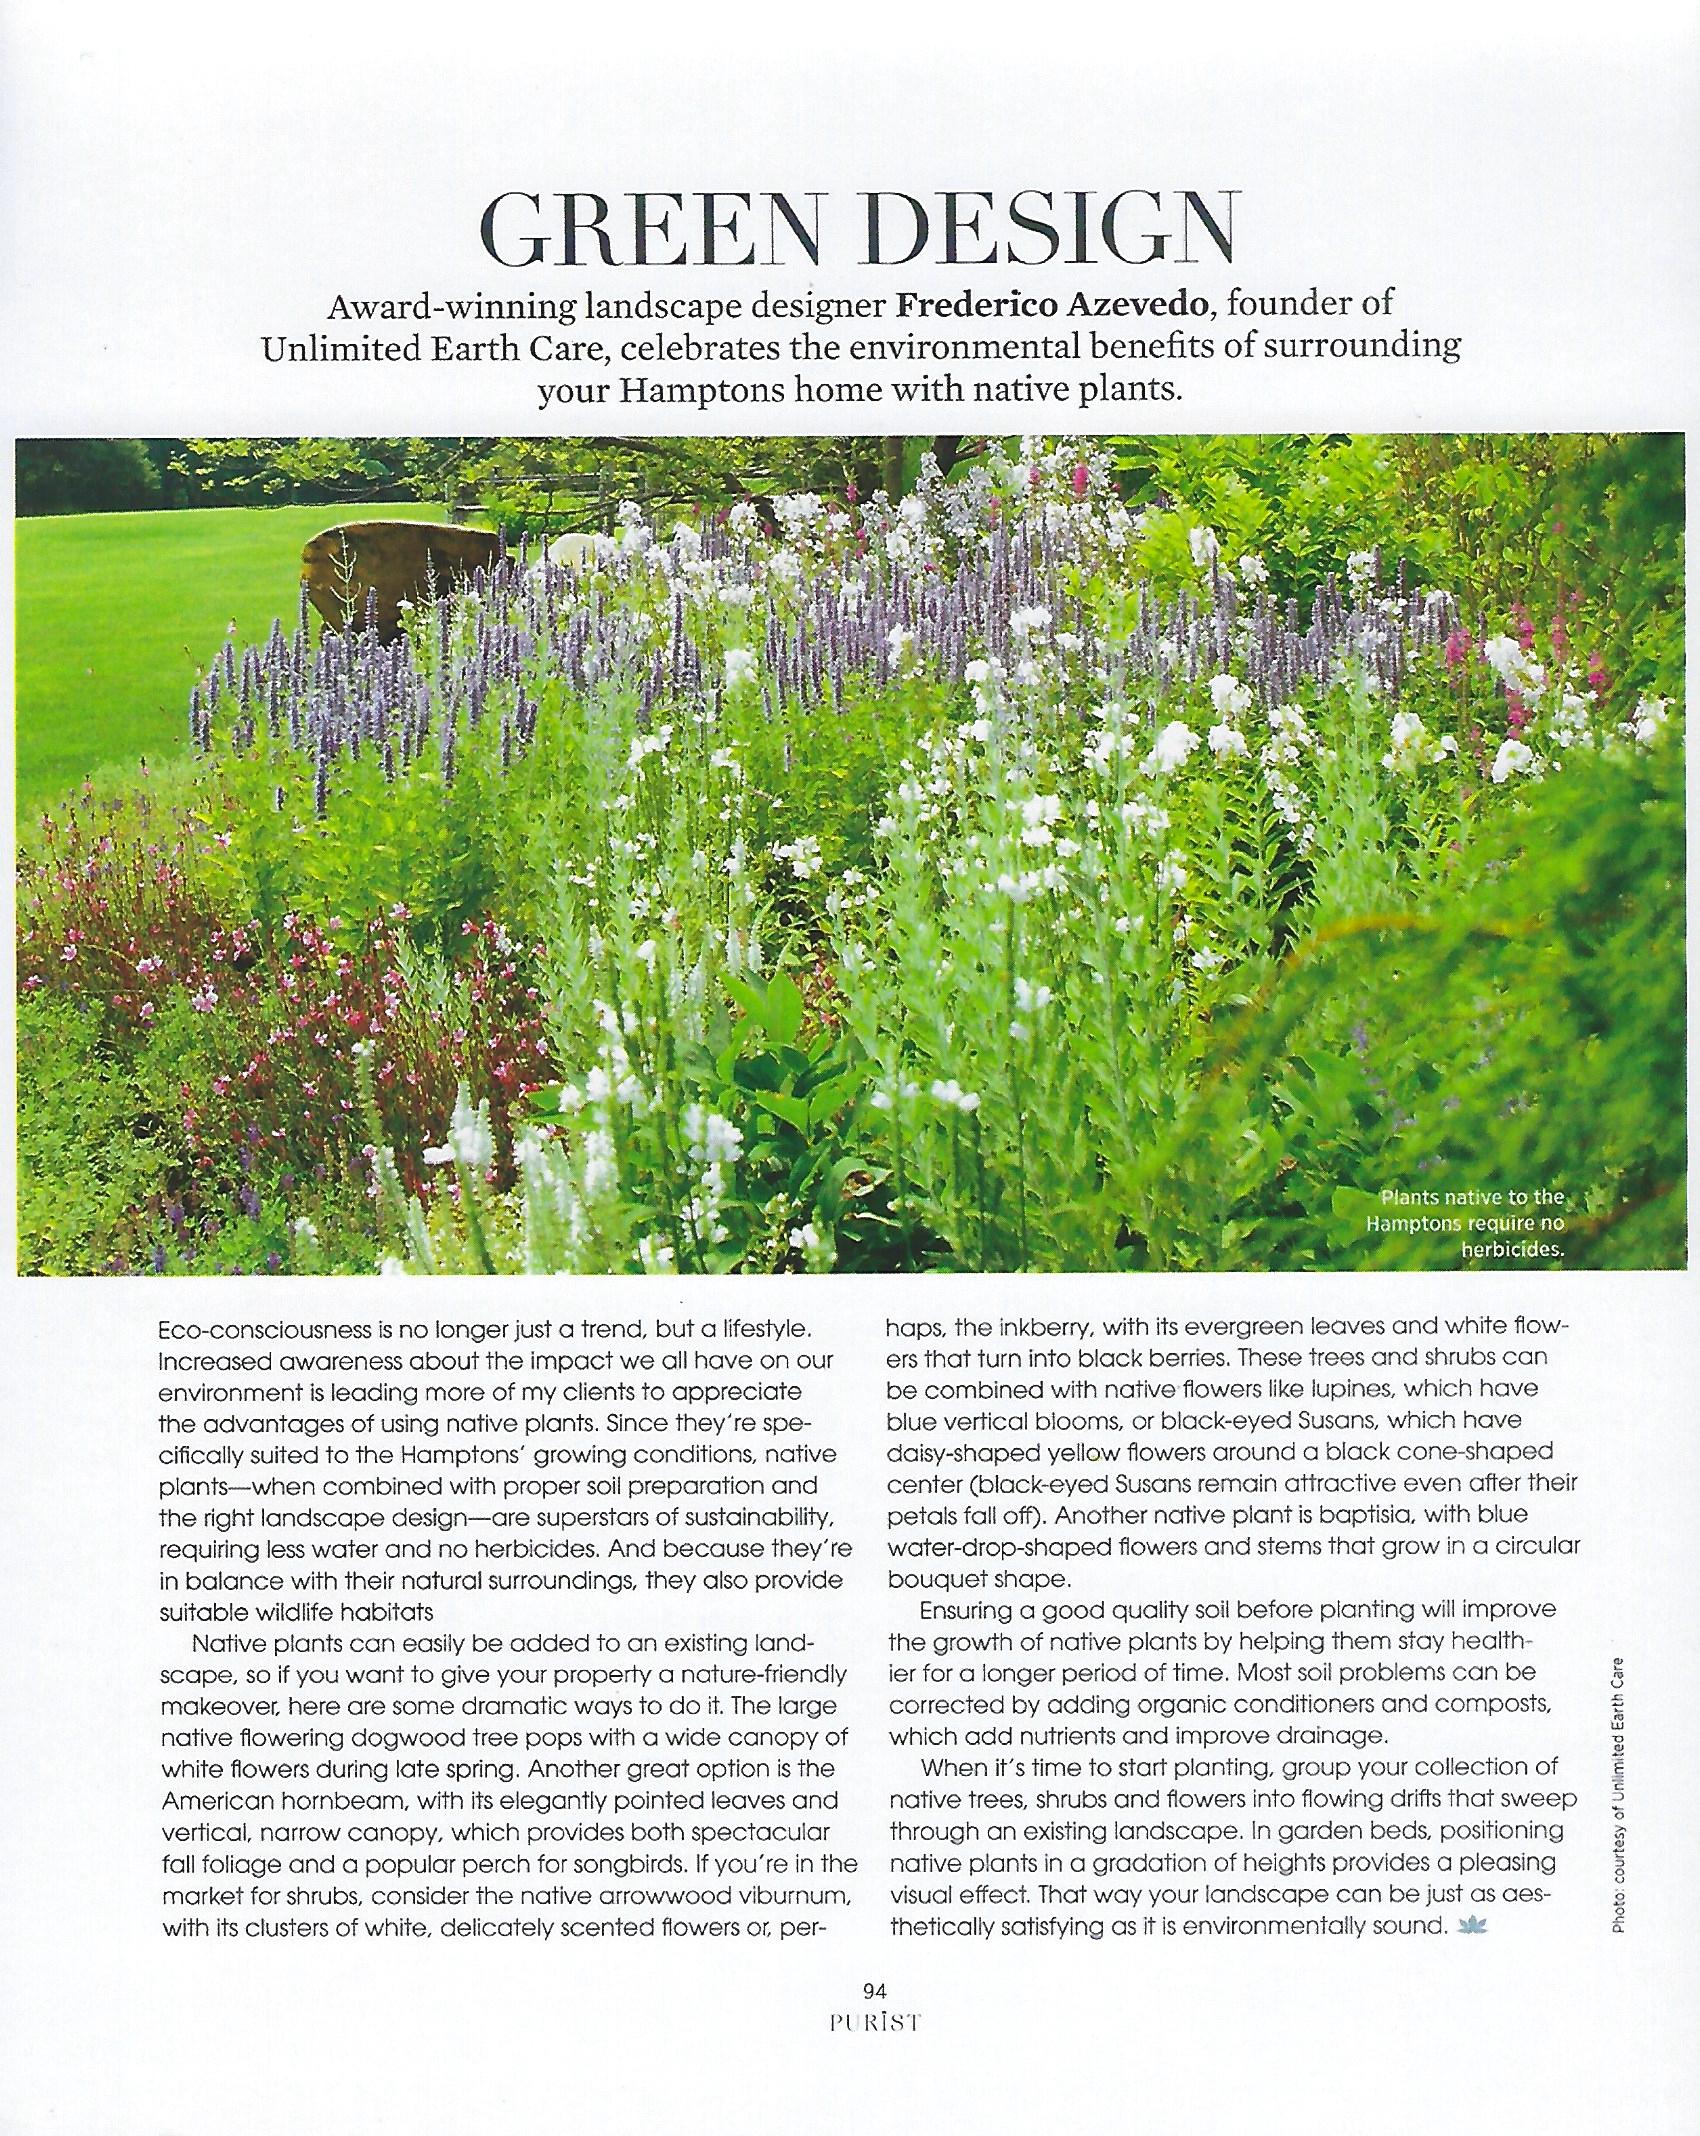 Purist - Green Design_June 2017.jpg